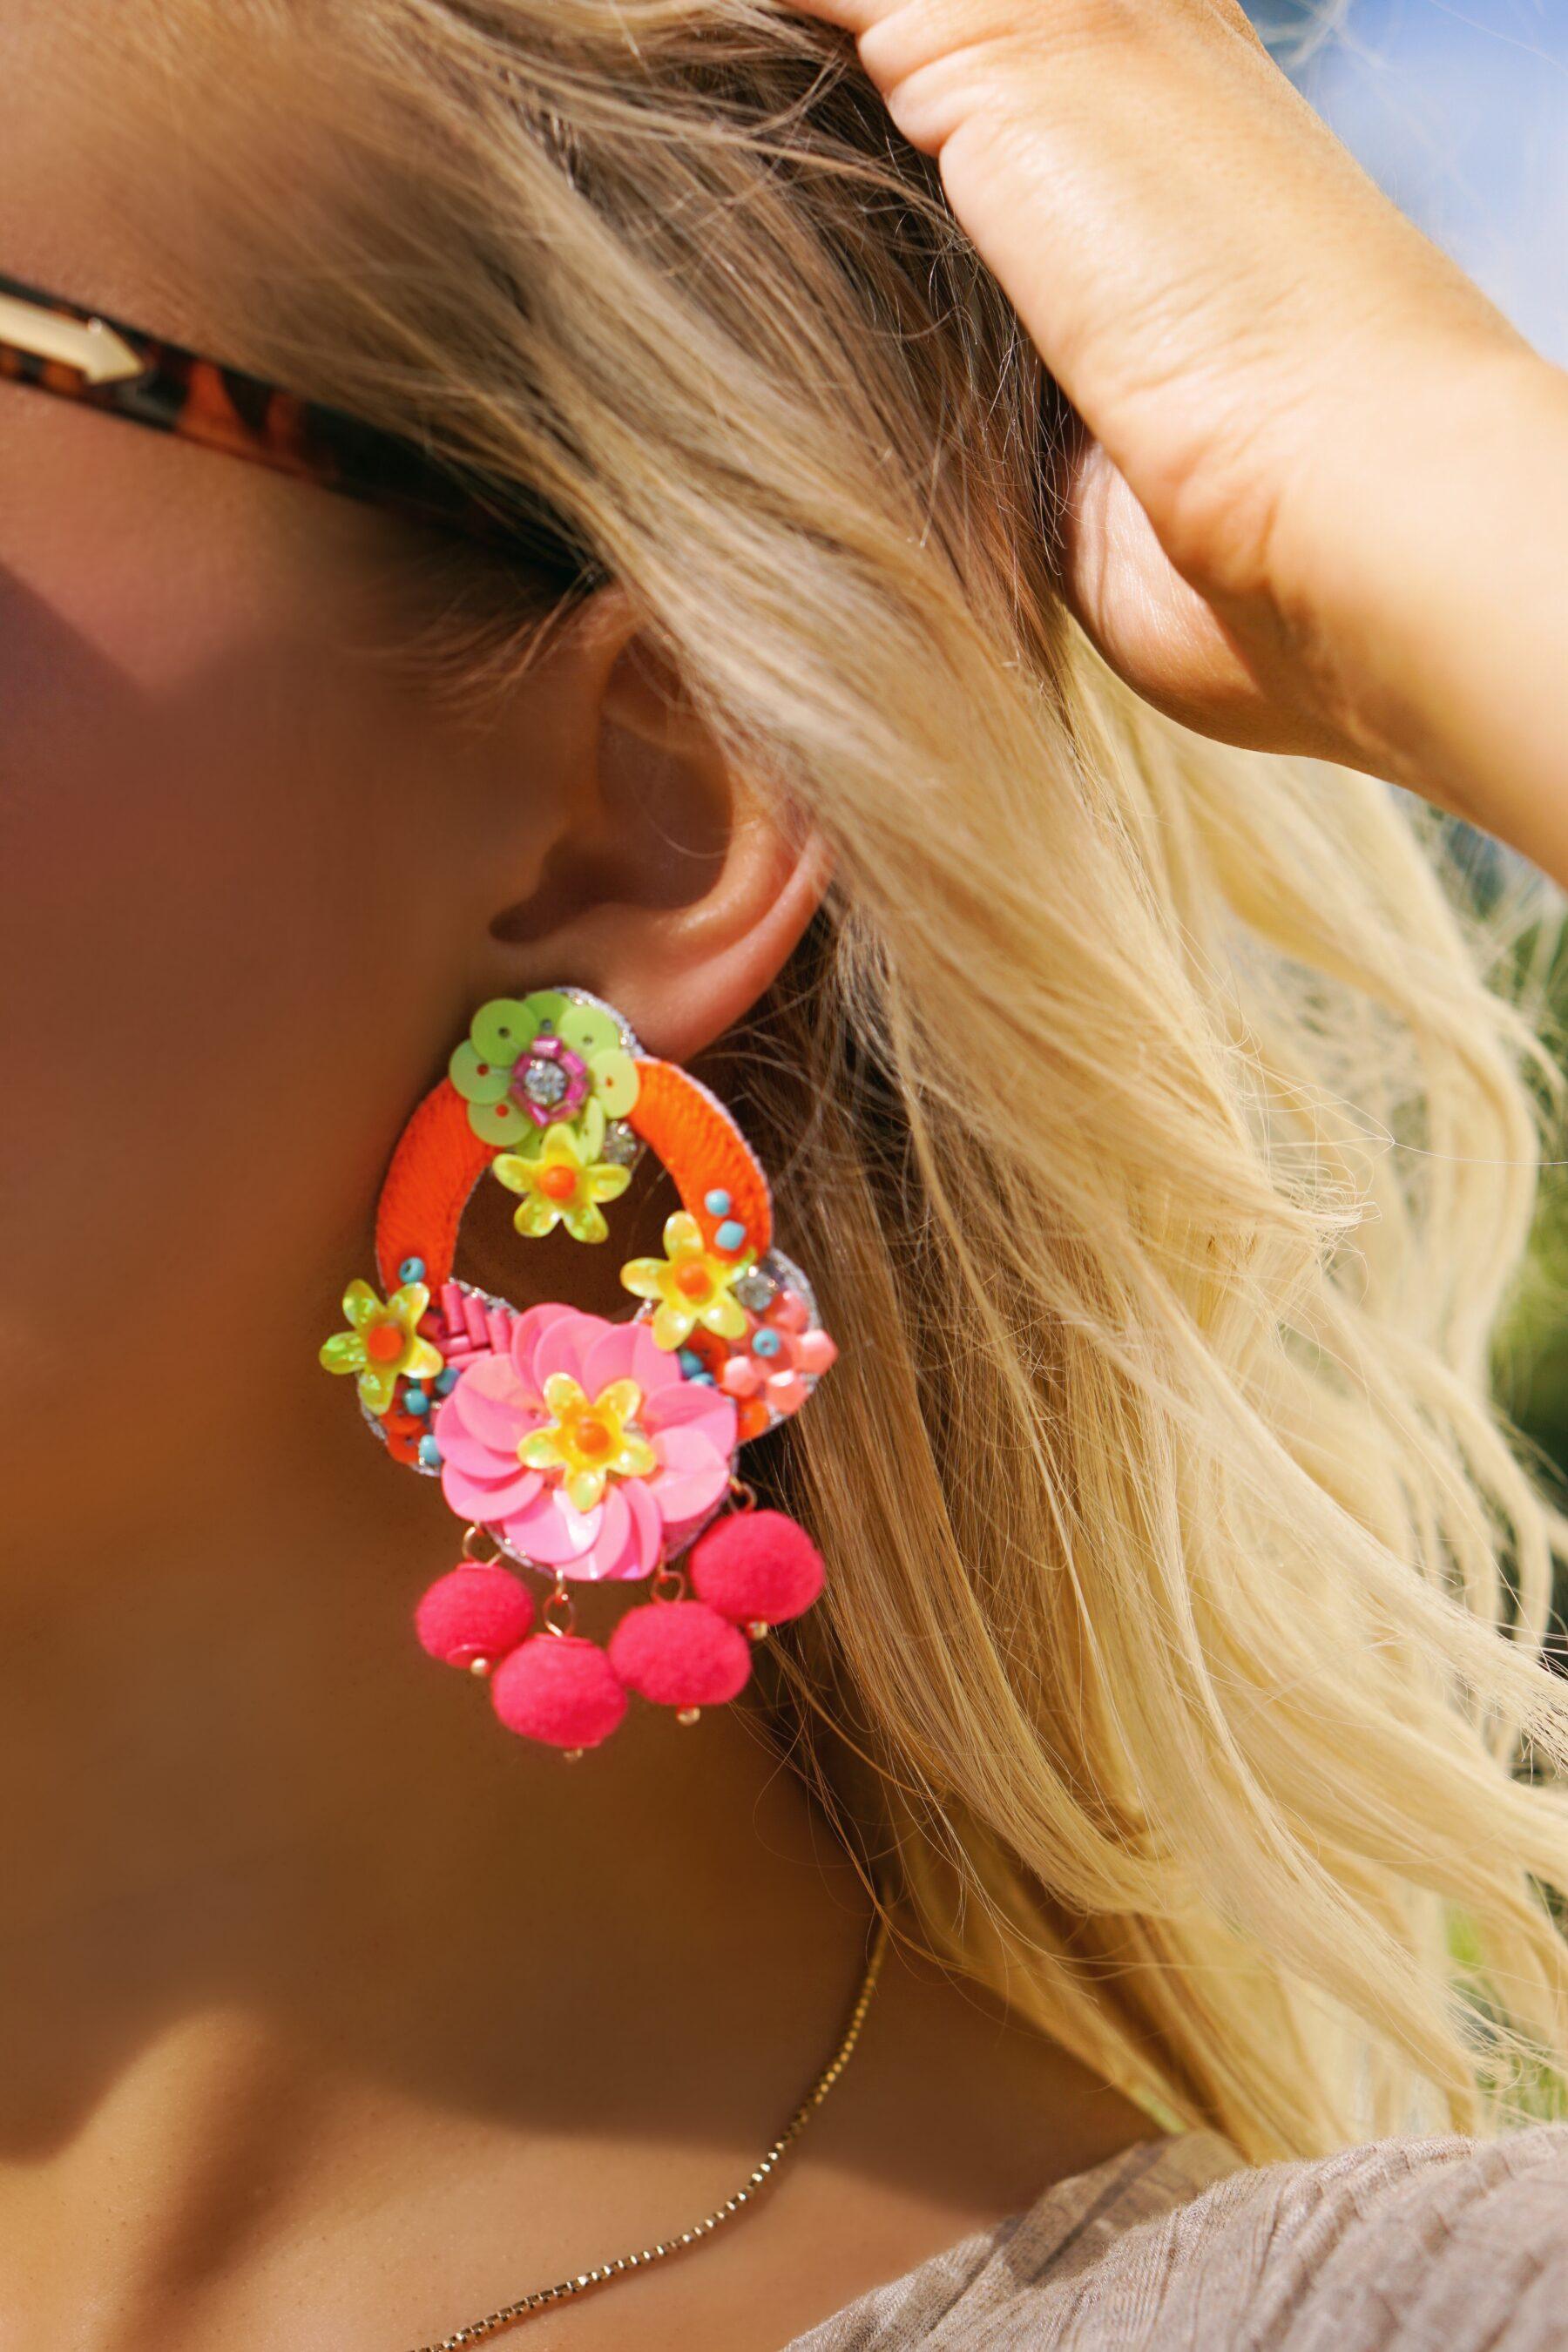 Francesca's pom pom statement earrings